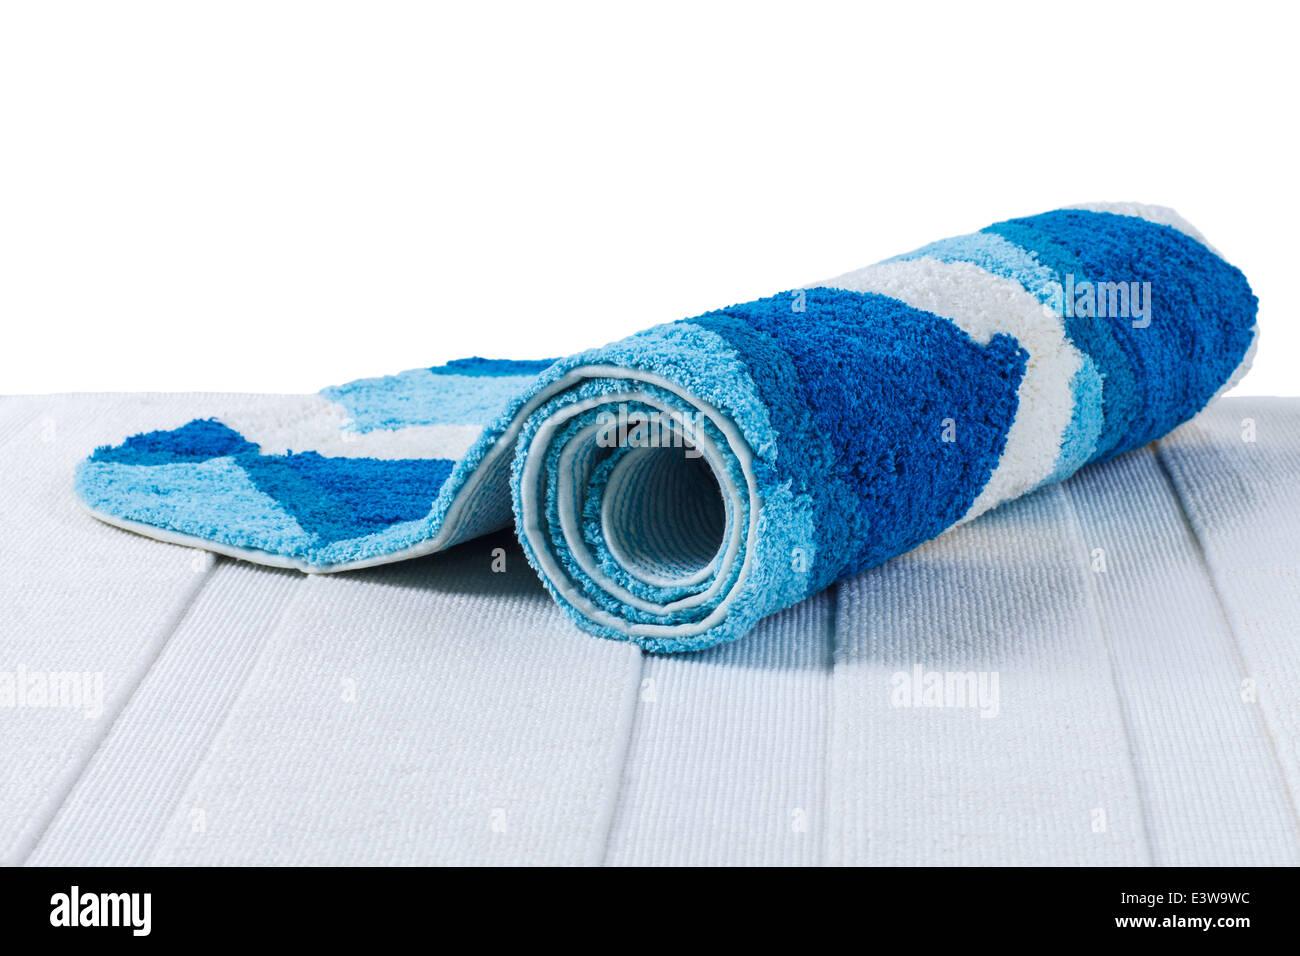 la alfombra azul enrollada sobre alfombra blanca foto & imagen de